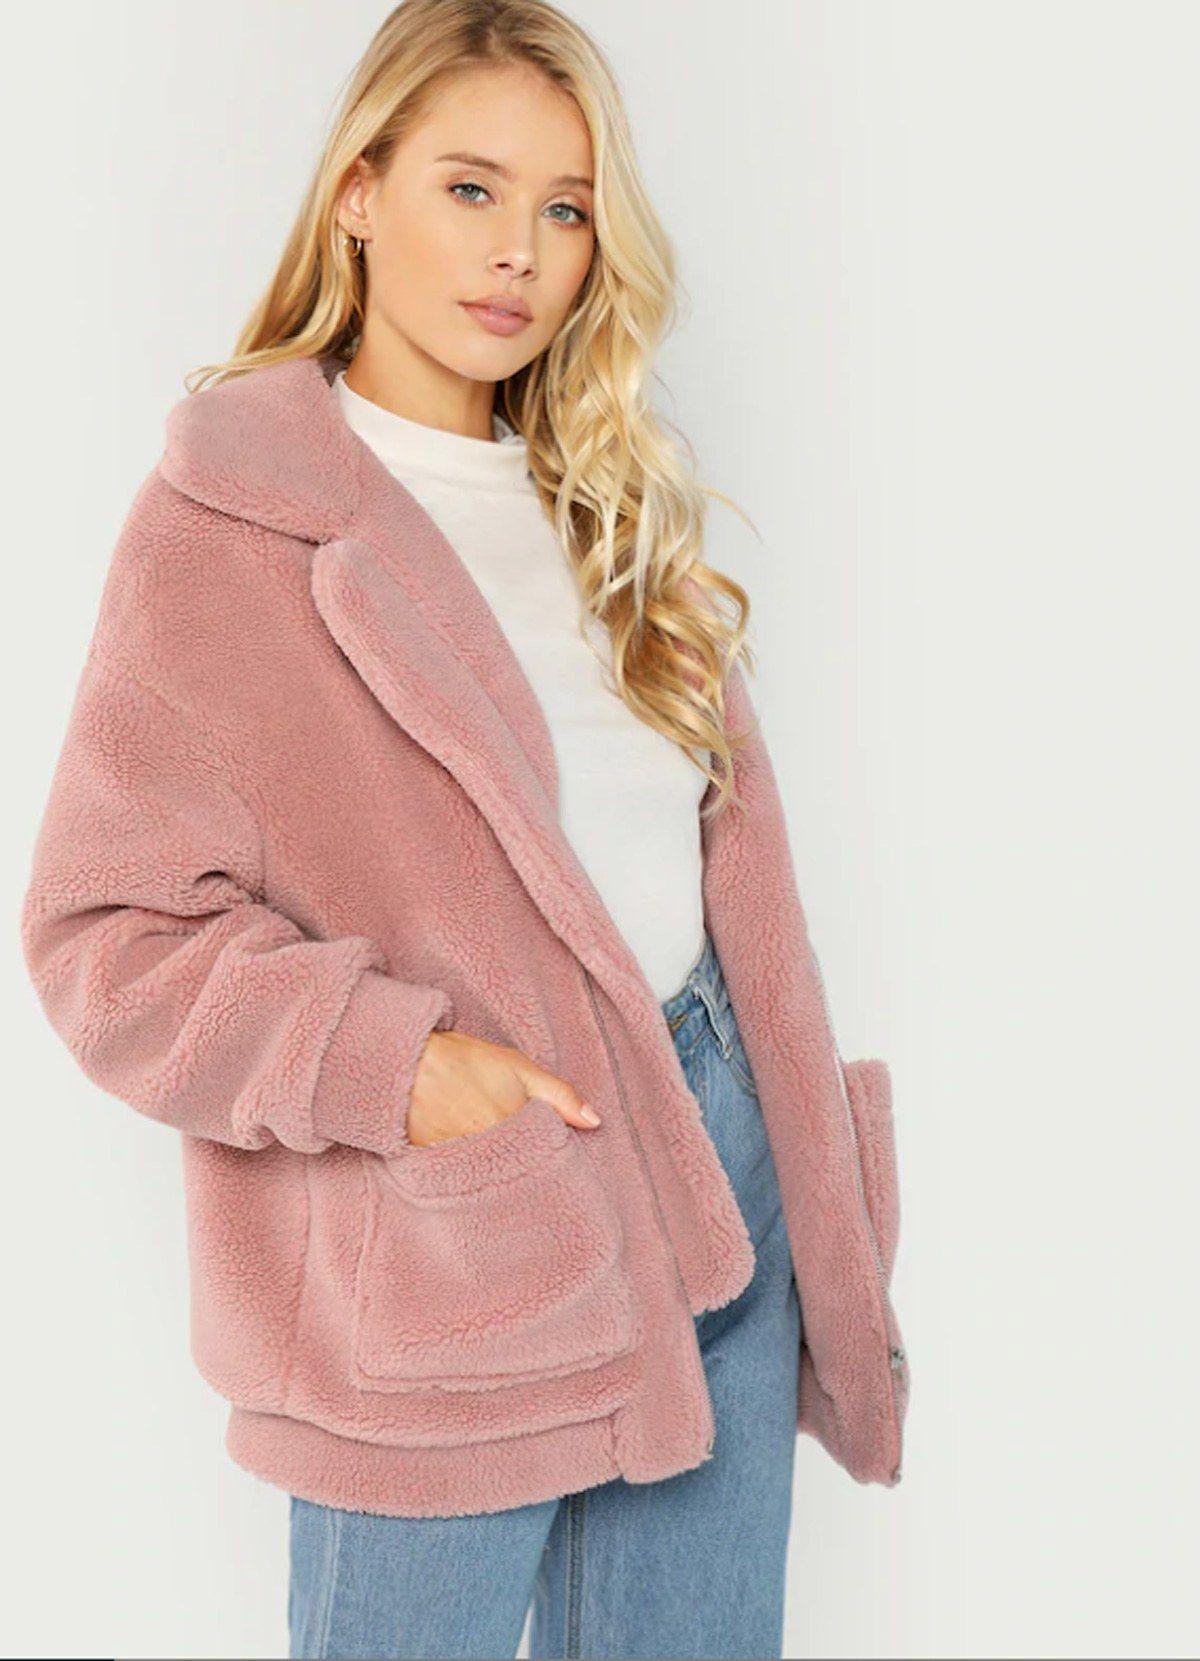 9407e58db 17 Fleece Jackets Under $50 That Basically Feel Like a Warm Hug ...